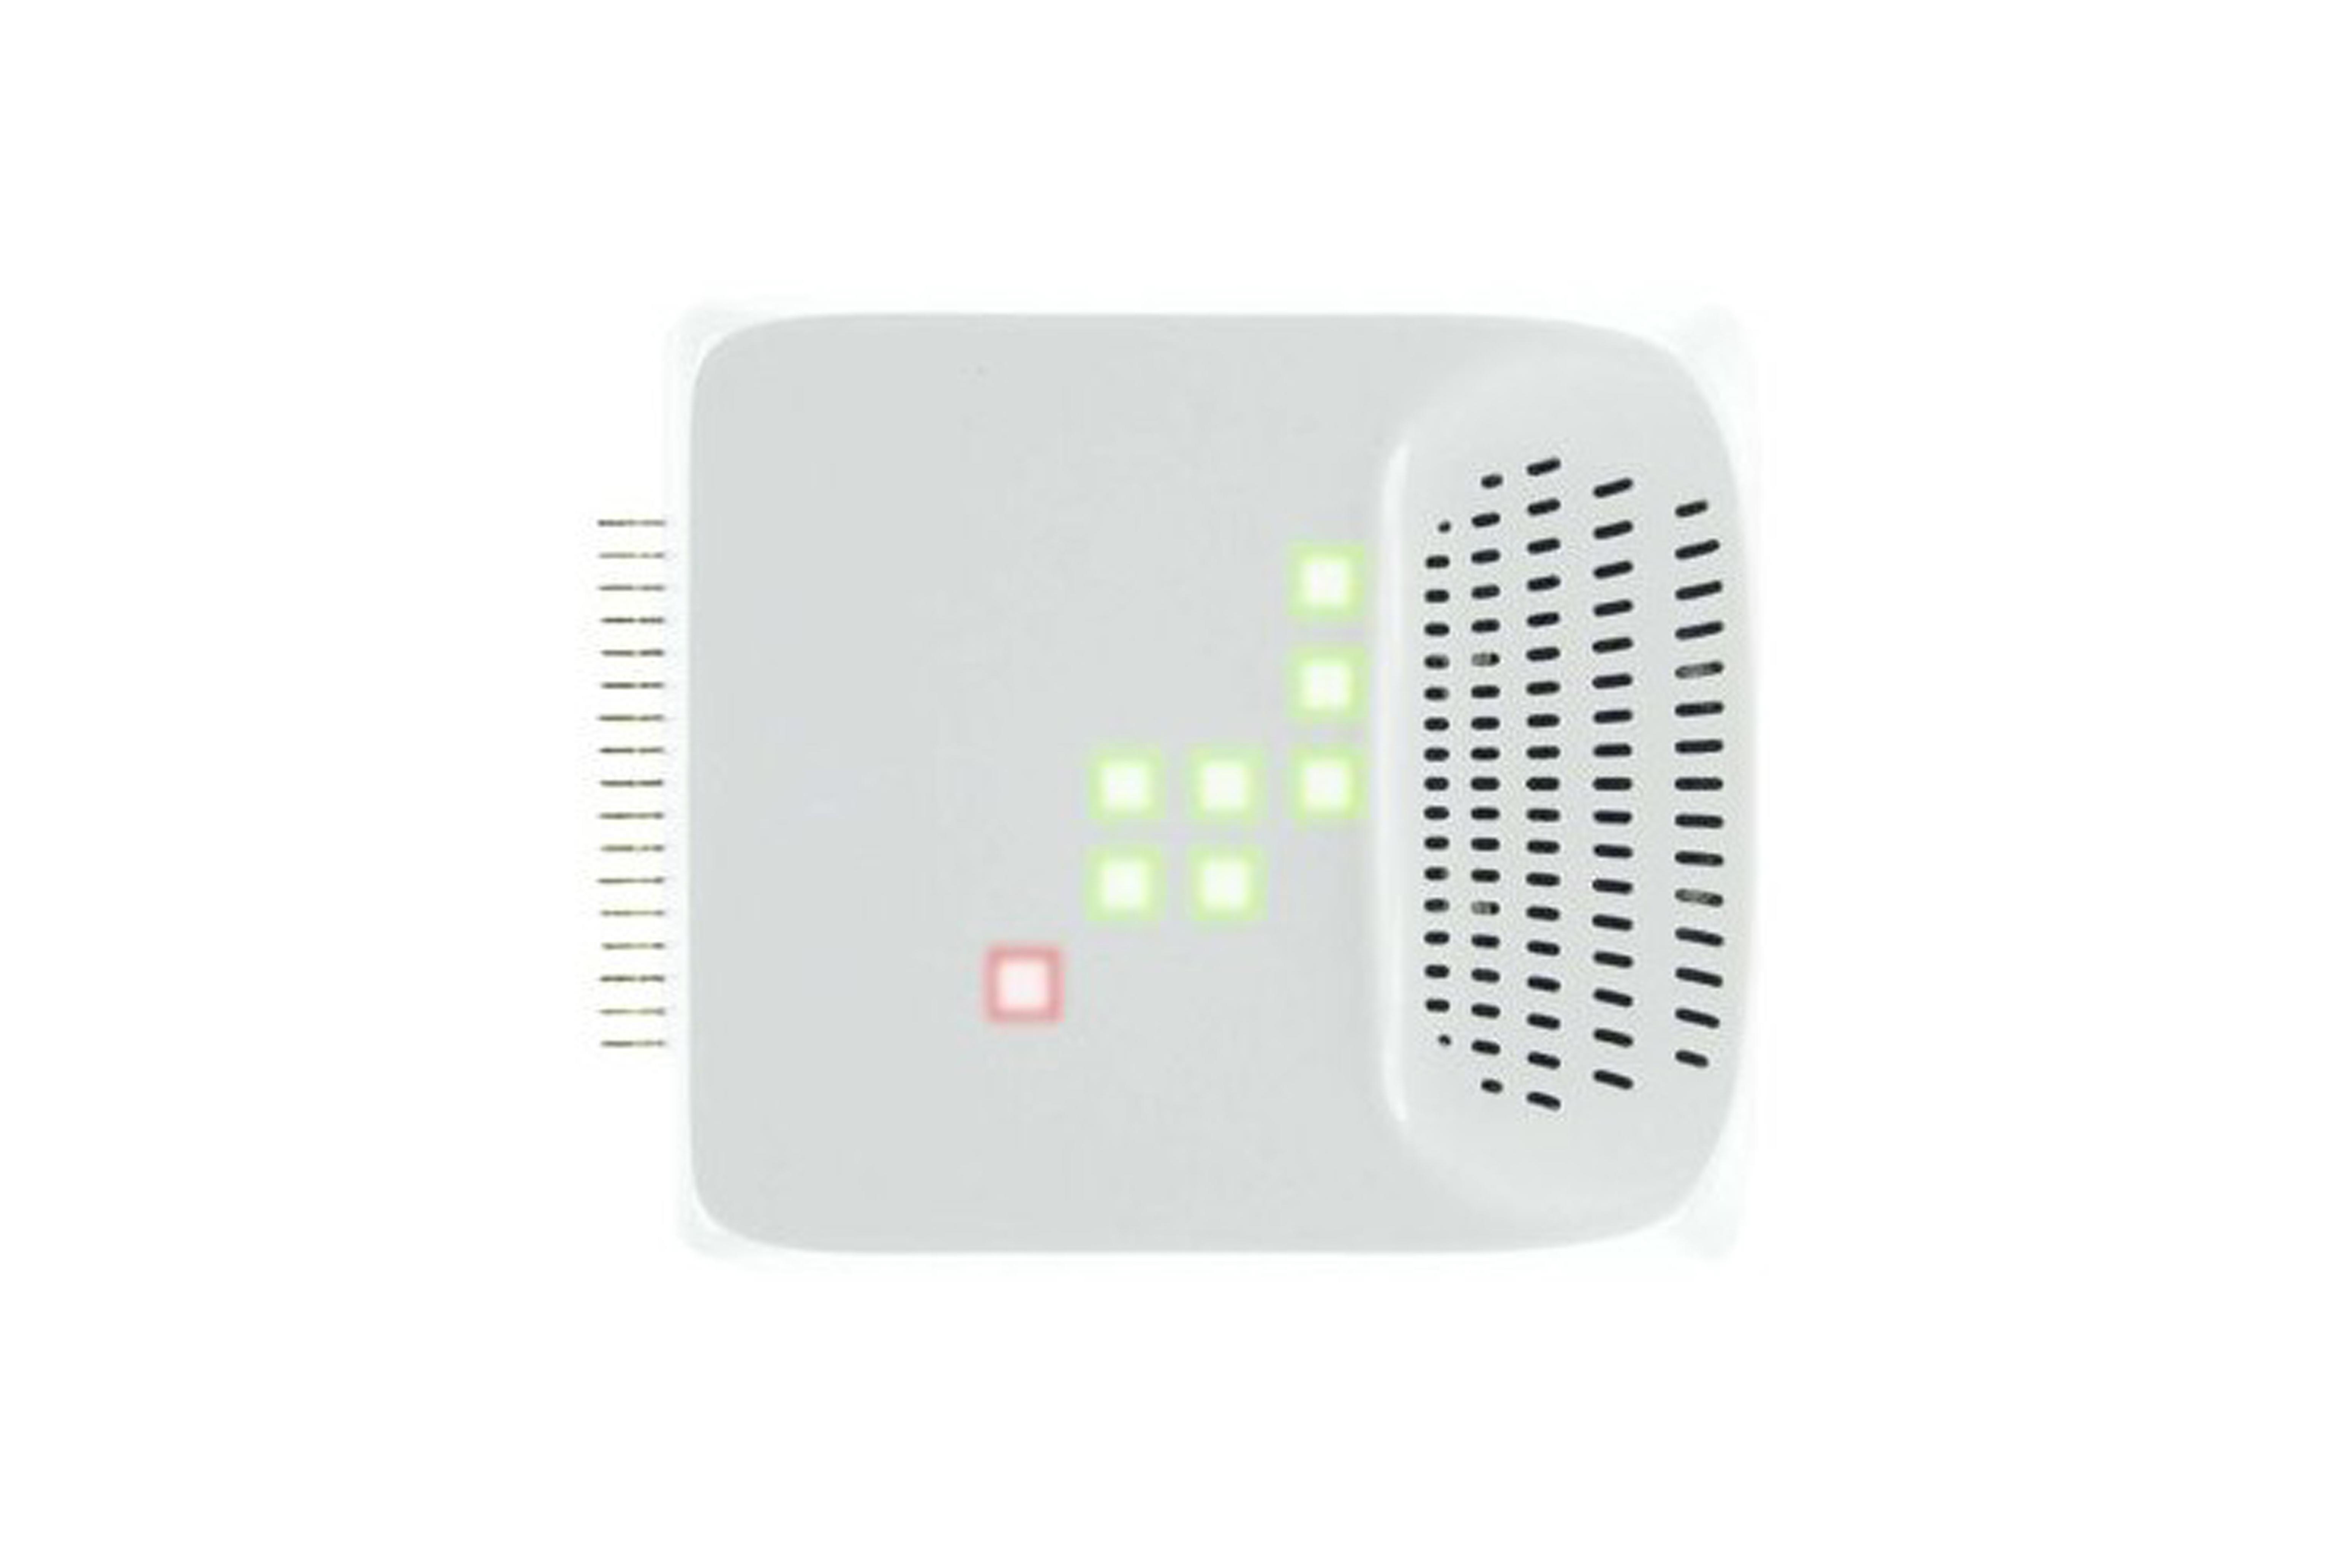 Pi-Top(パイトップ)PULSE Smart Speaker w LED Matrix